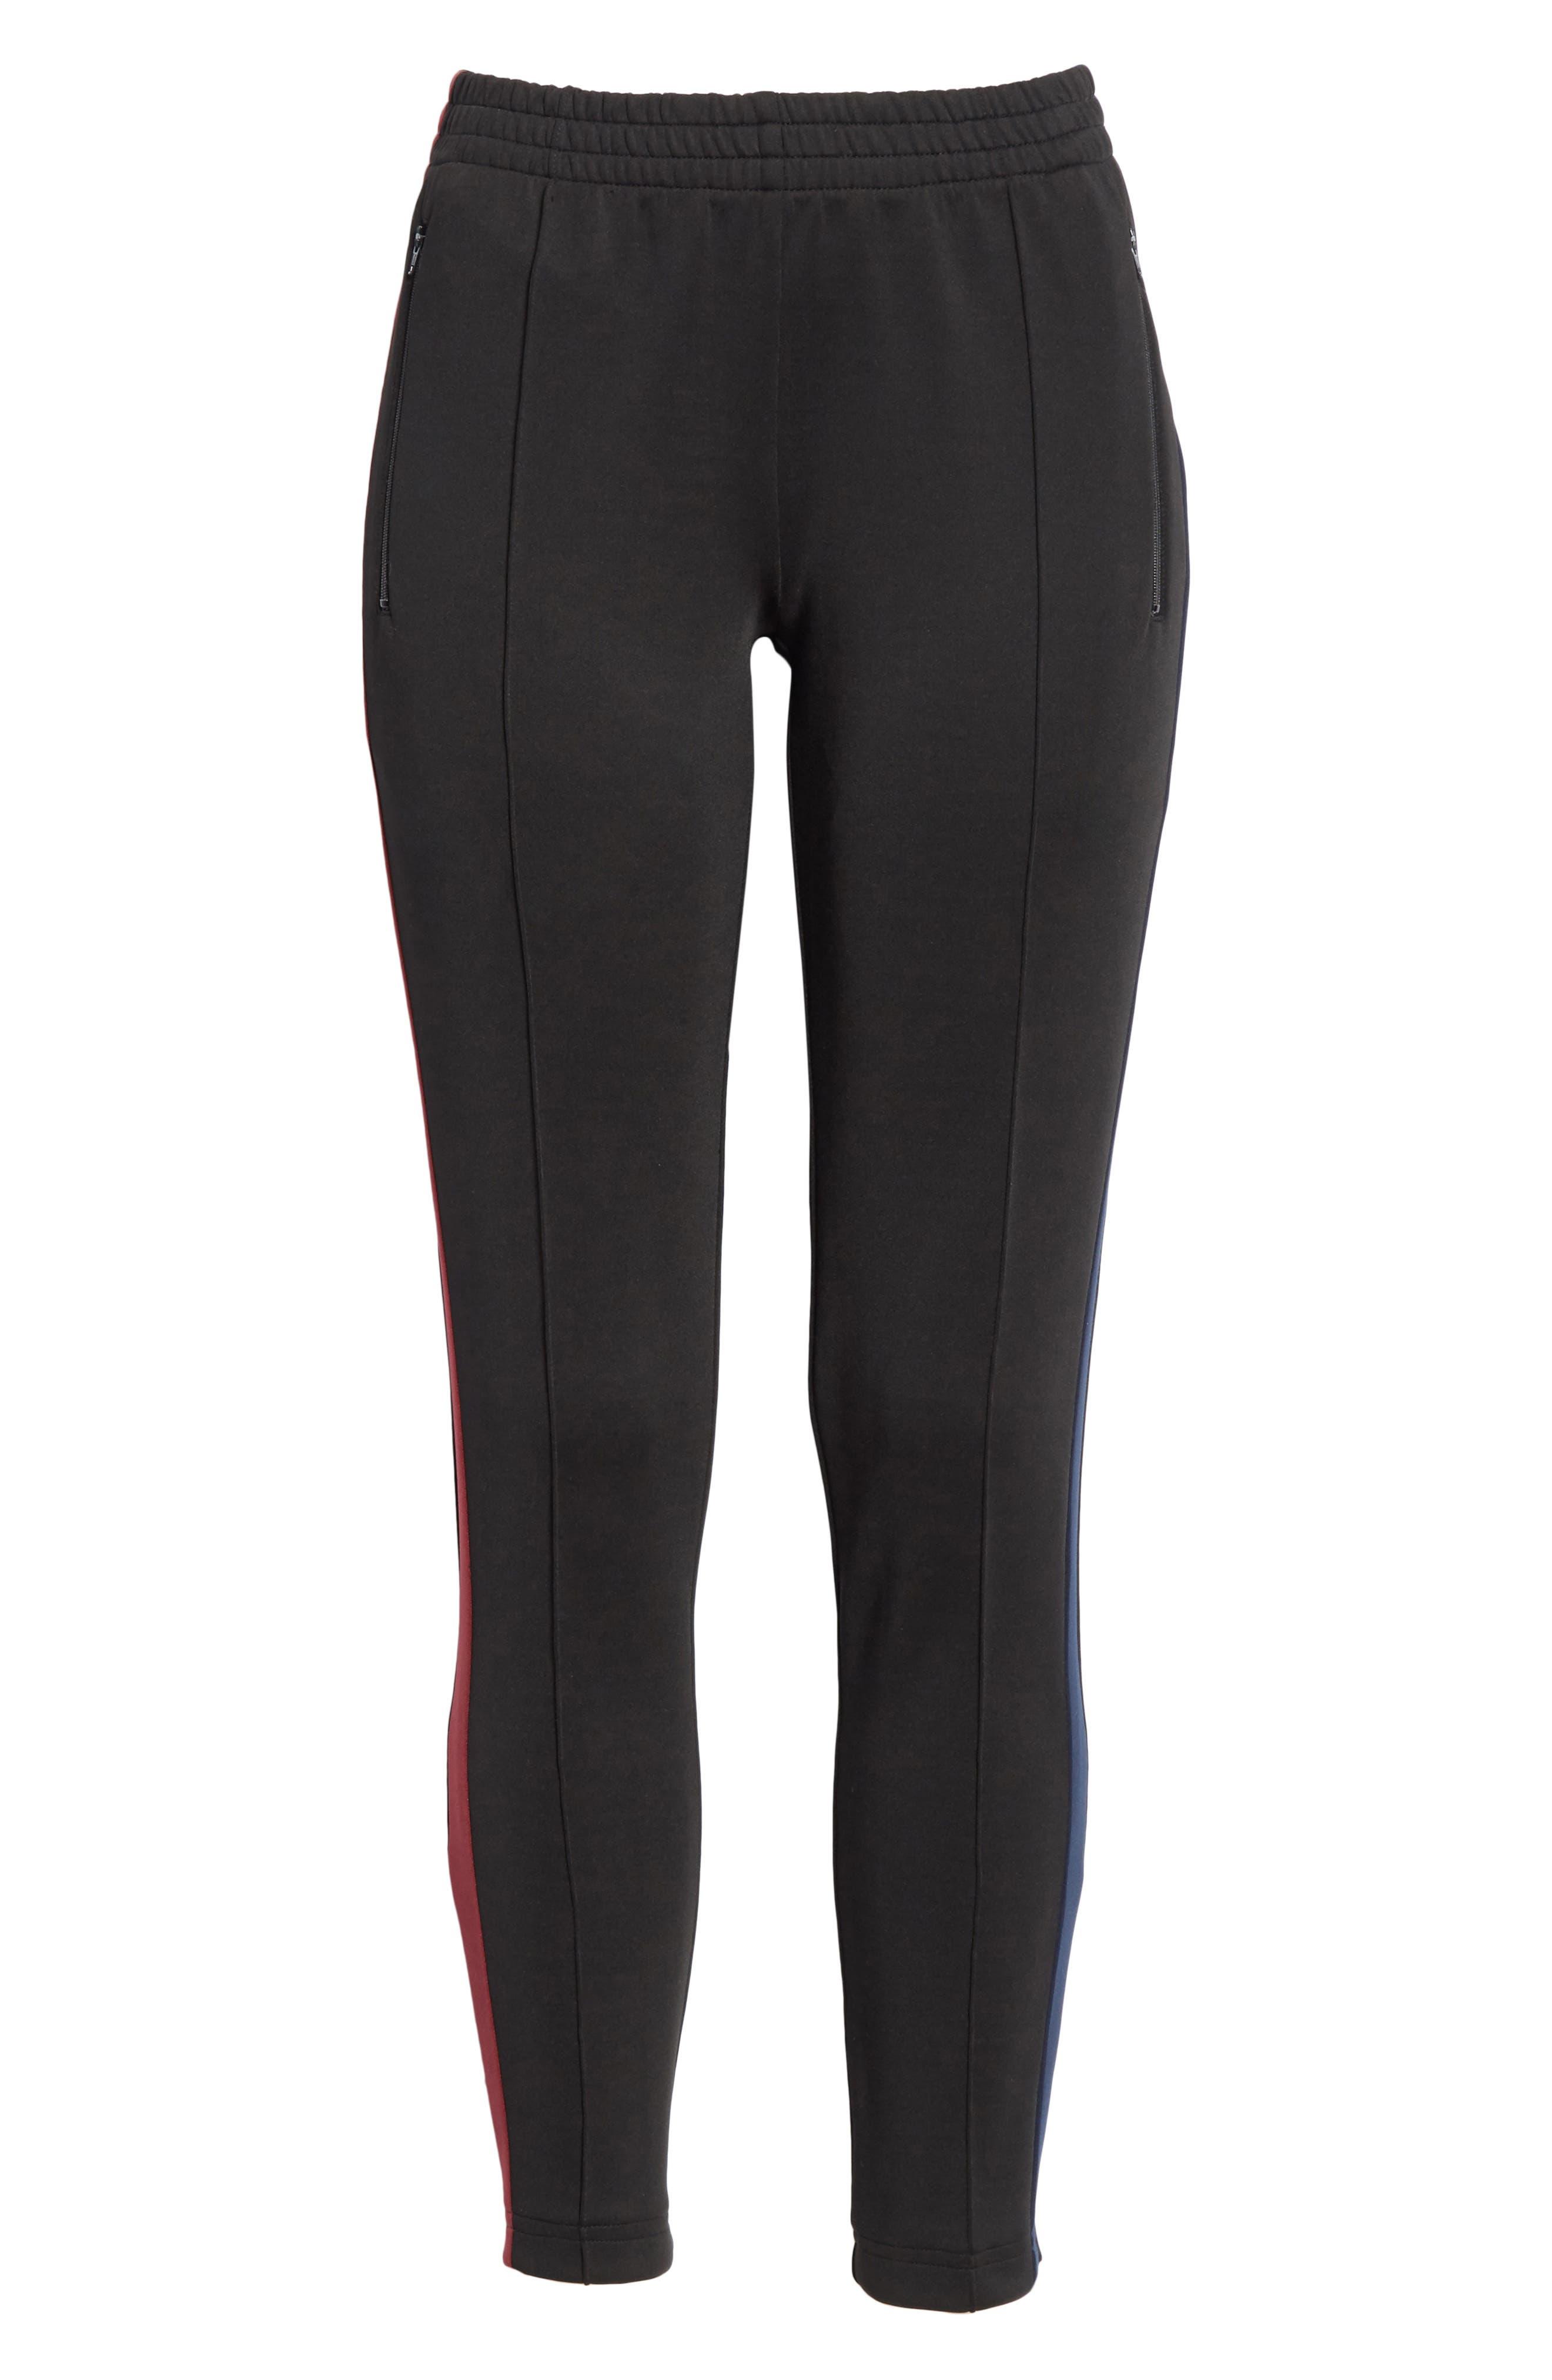 Tricot Track Pants,                             Alternate thumbnail 6, color,                             Black